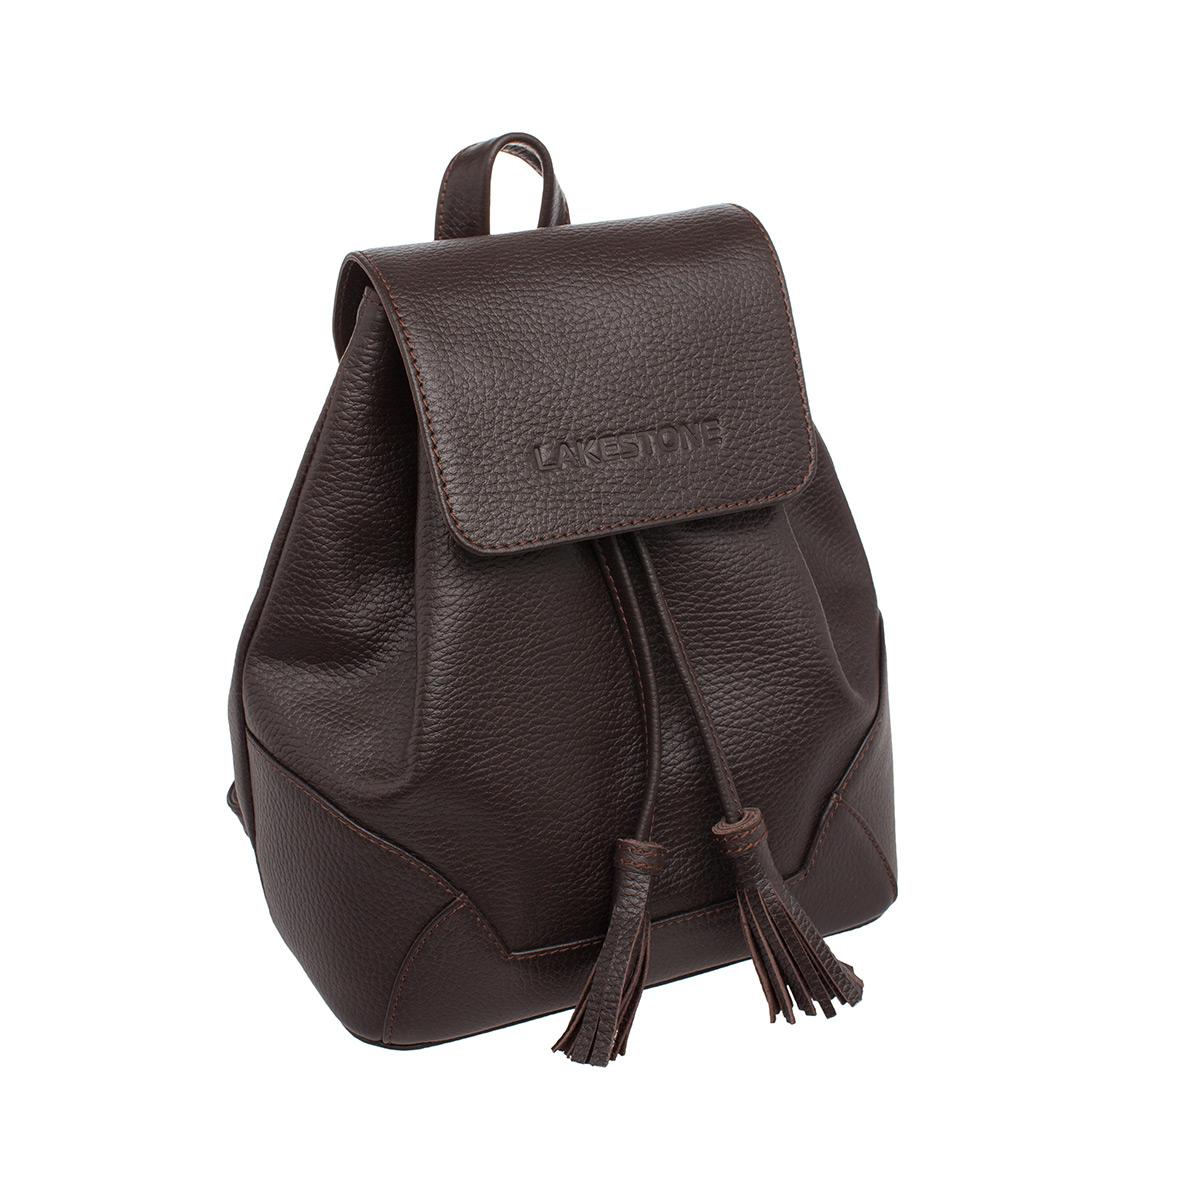 Рюкзак женский кожаный Lakestone 9123417/BR фото